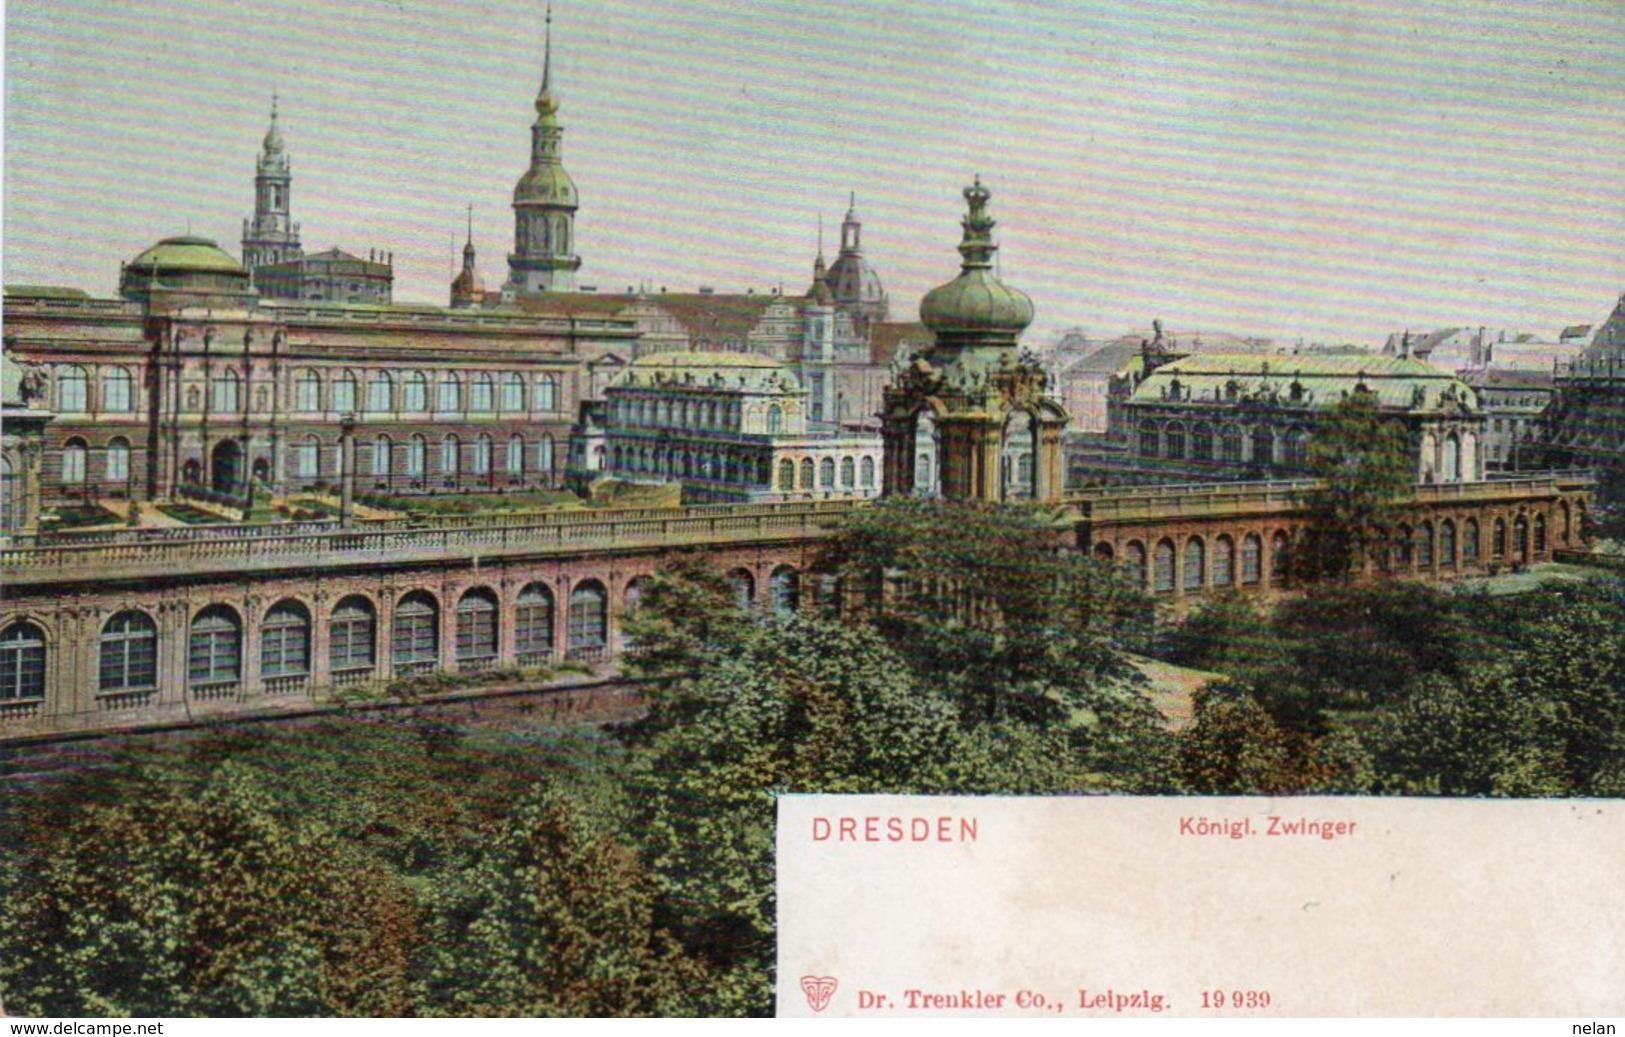 DRESDEN-KONIGL.ZWINGER-1900-NON VIAGGIATA - Dresden